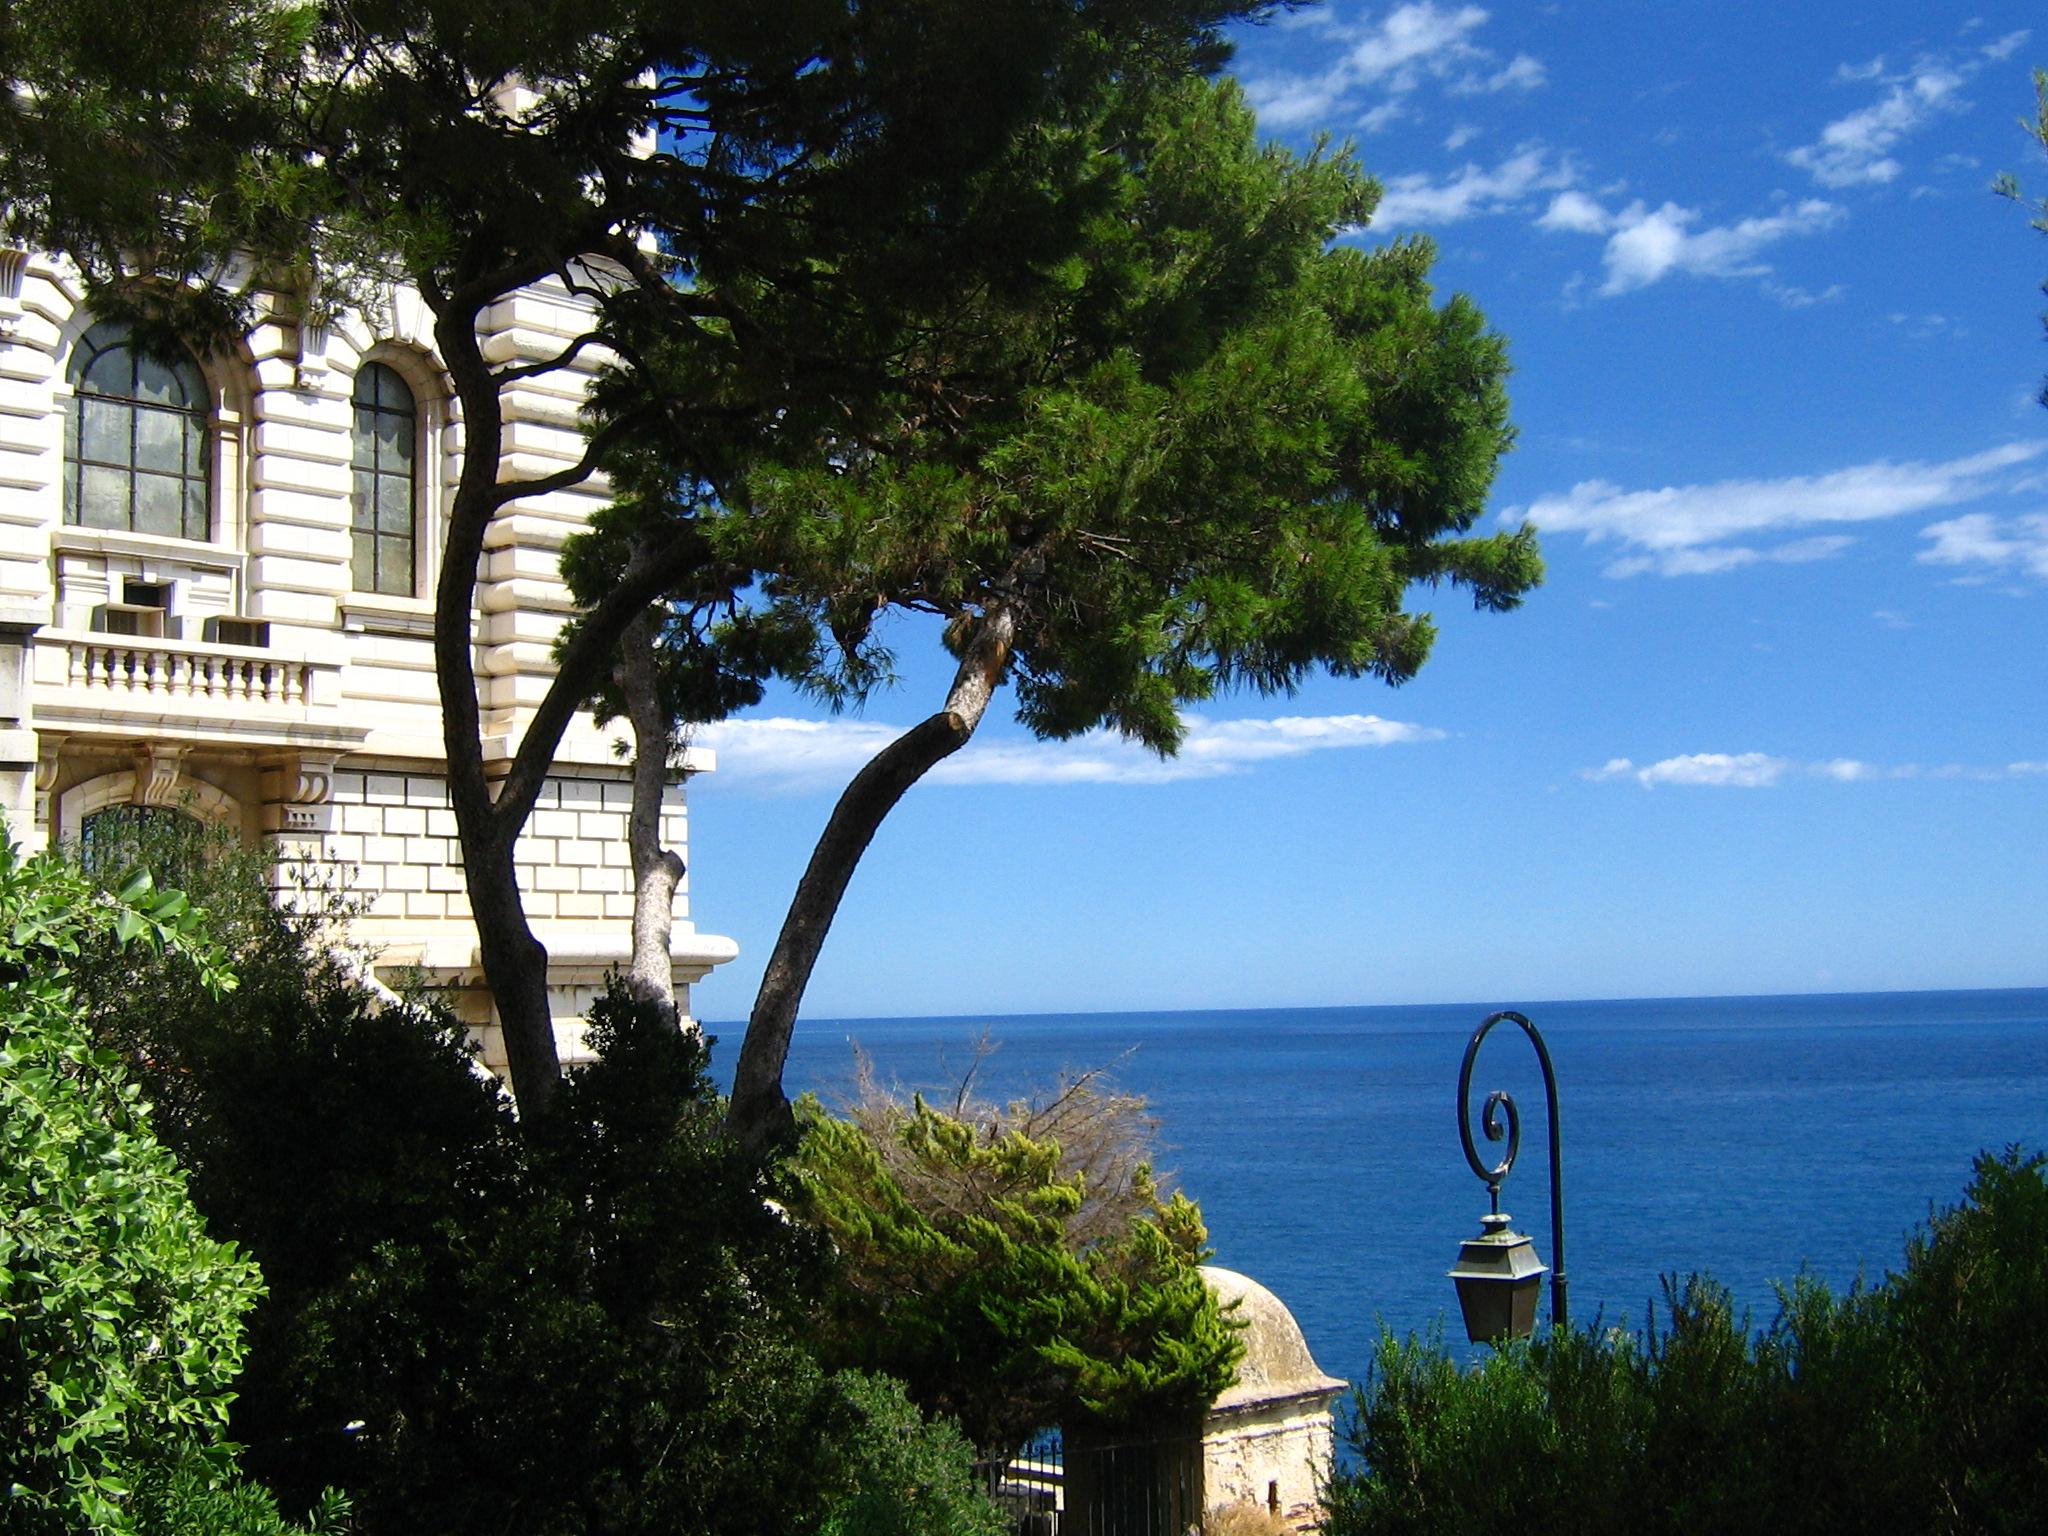 filejardin exotique de monaco1jpg wikimedia commons With photo de jardin exotique 1 filechorisia monaco jpg wikimedia commons